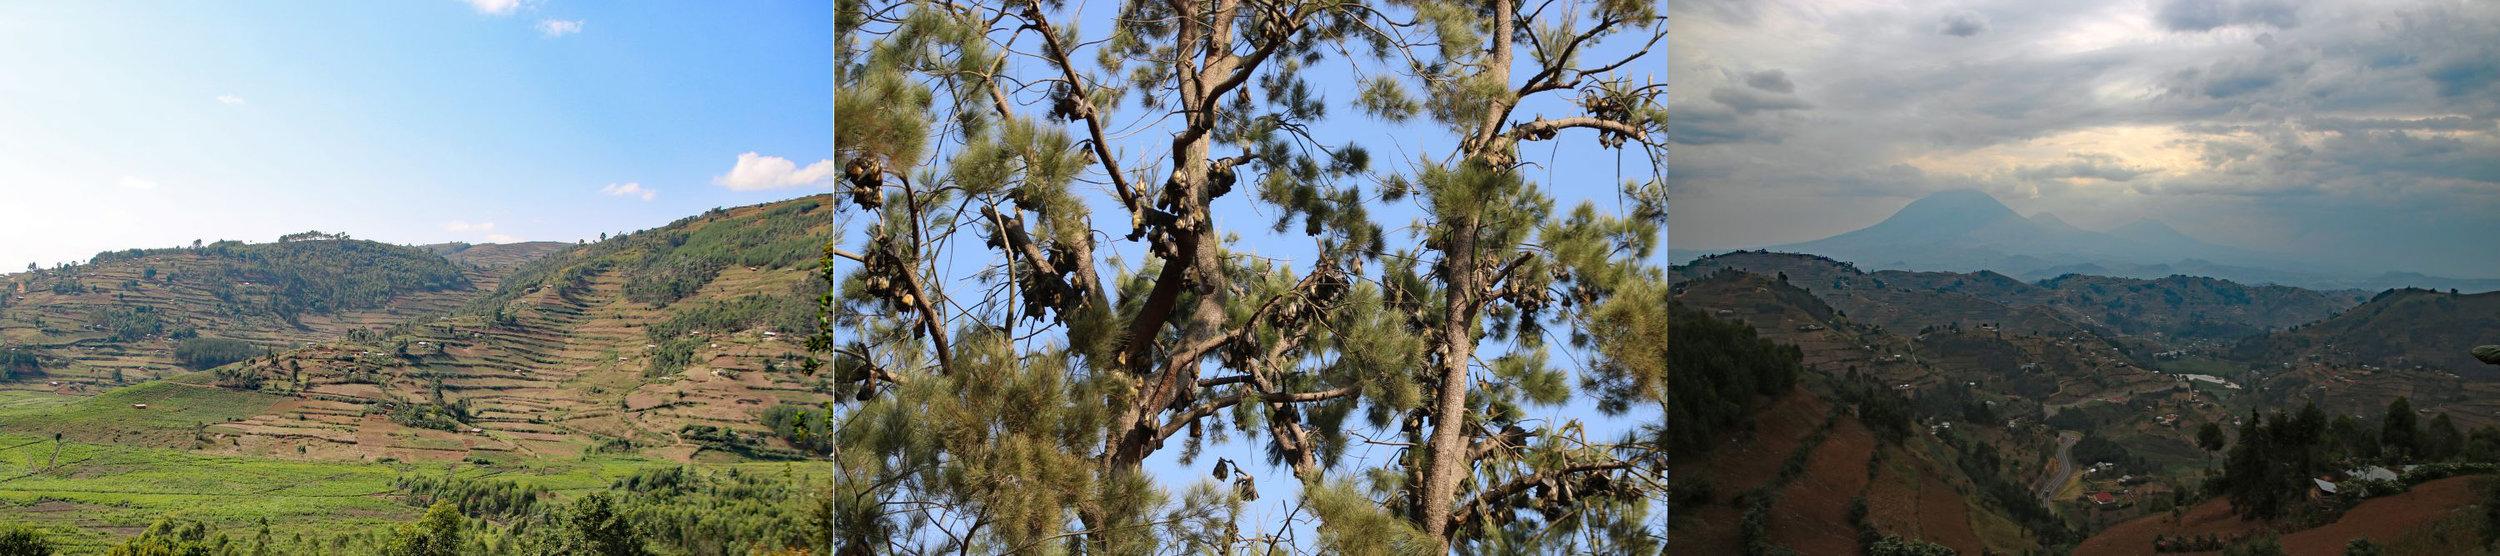 Muko terraced fields; Fruit bats in tree; Mt. Muhabura on border with Rwanda and DRC